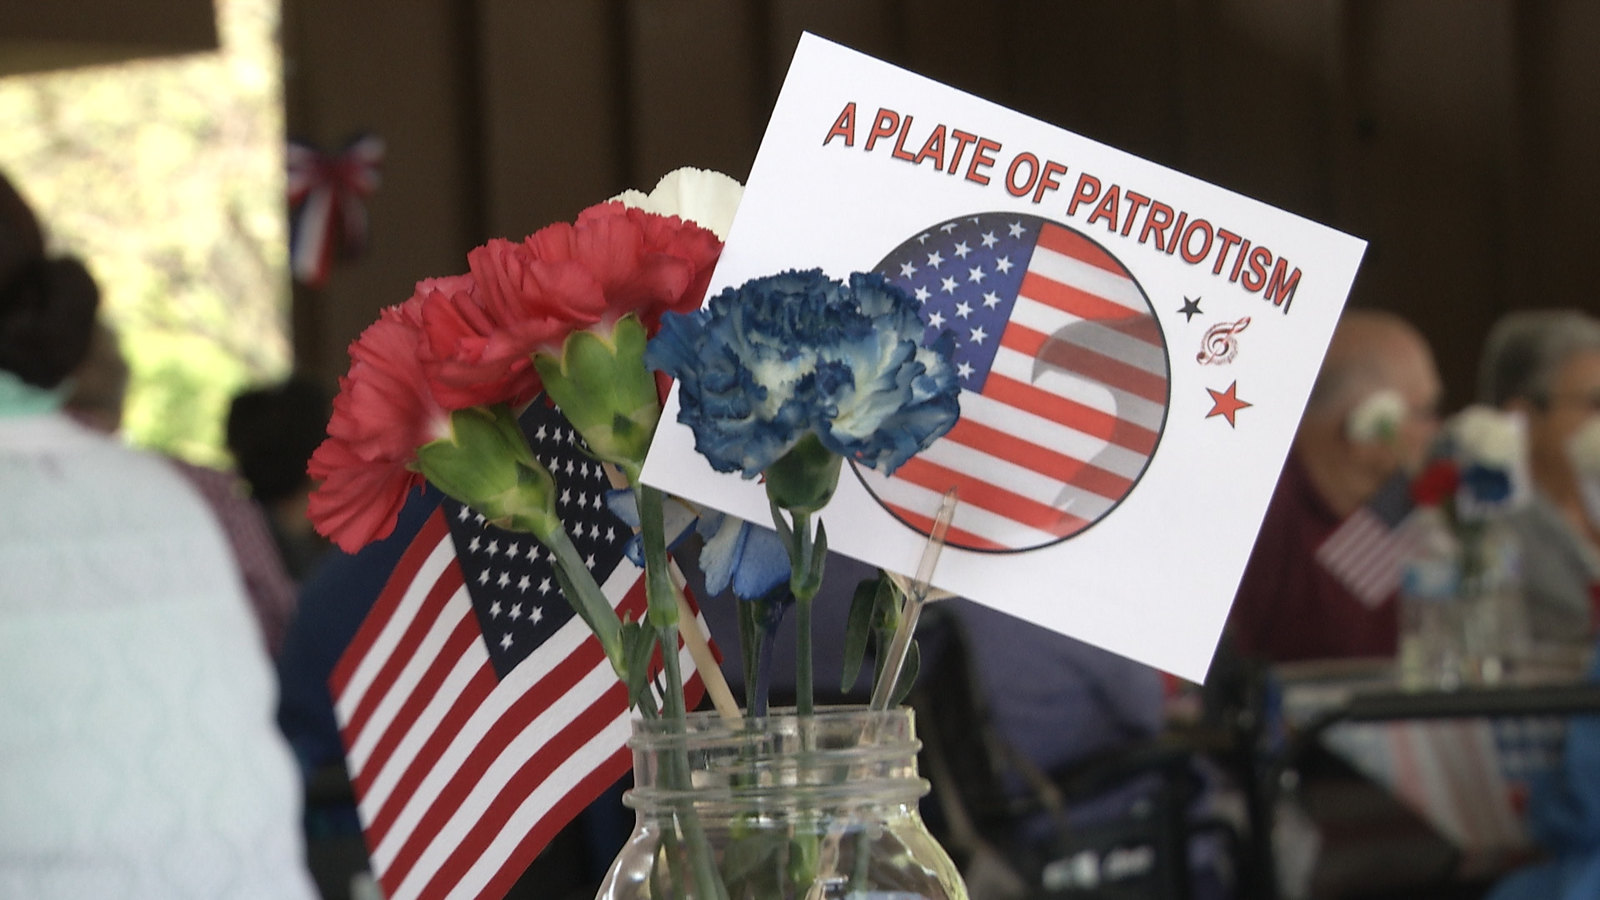 A Plate of Patriotism